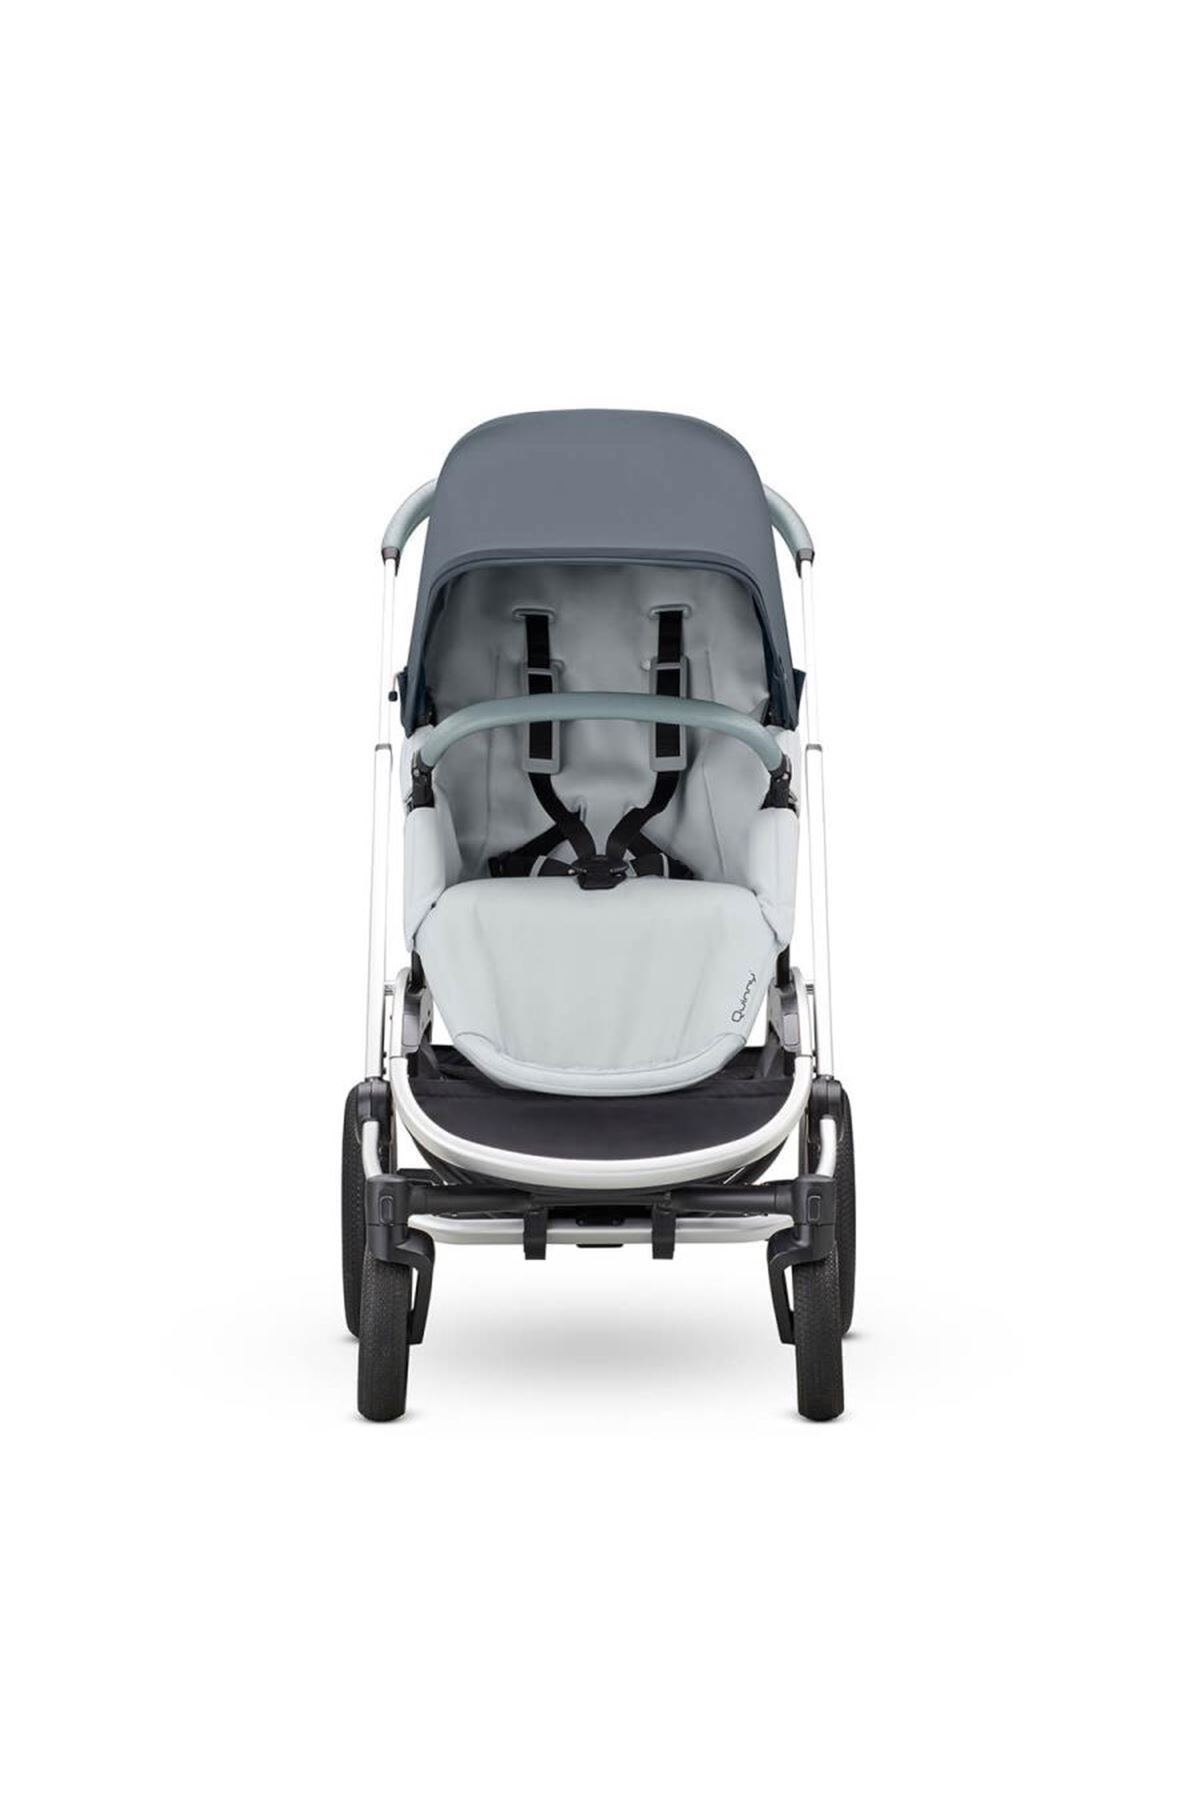 Quinny Hubb Bebek Arabası / Graphite on Grey